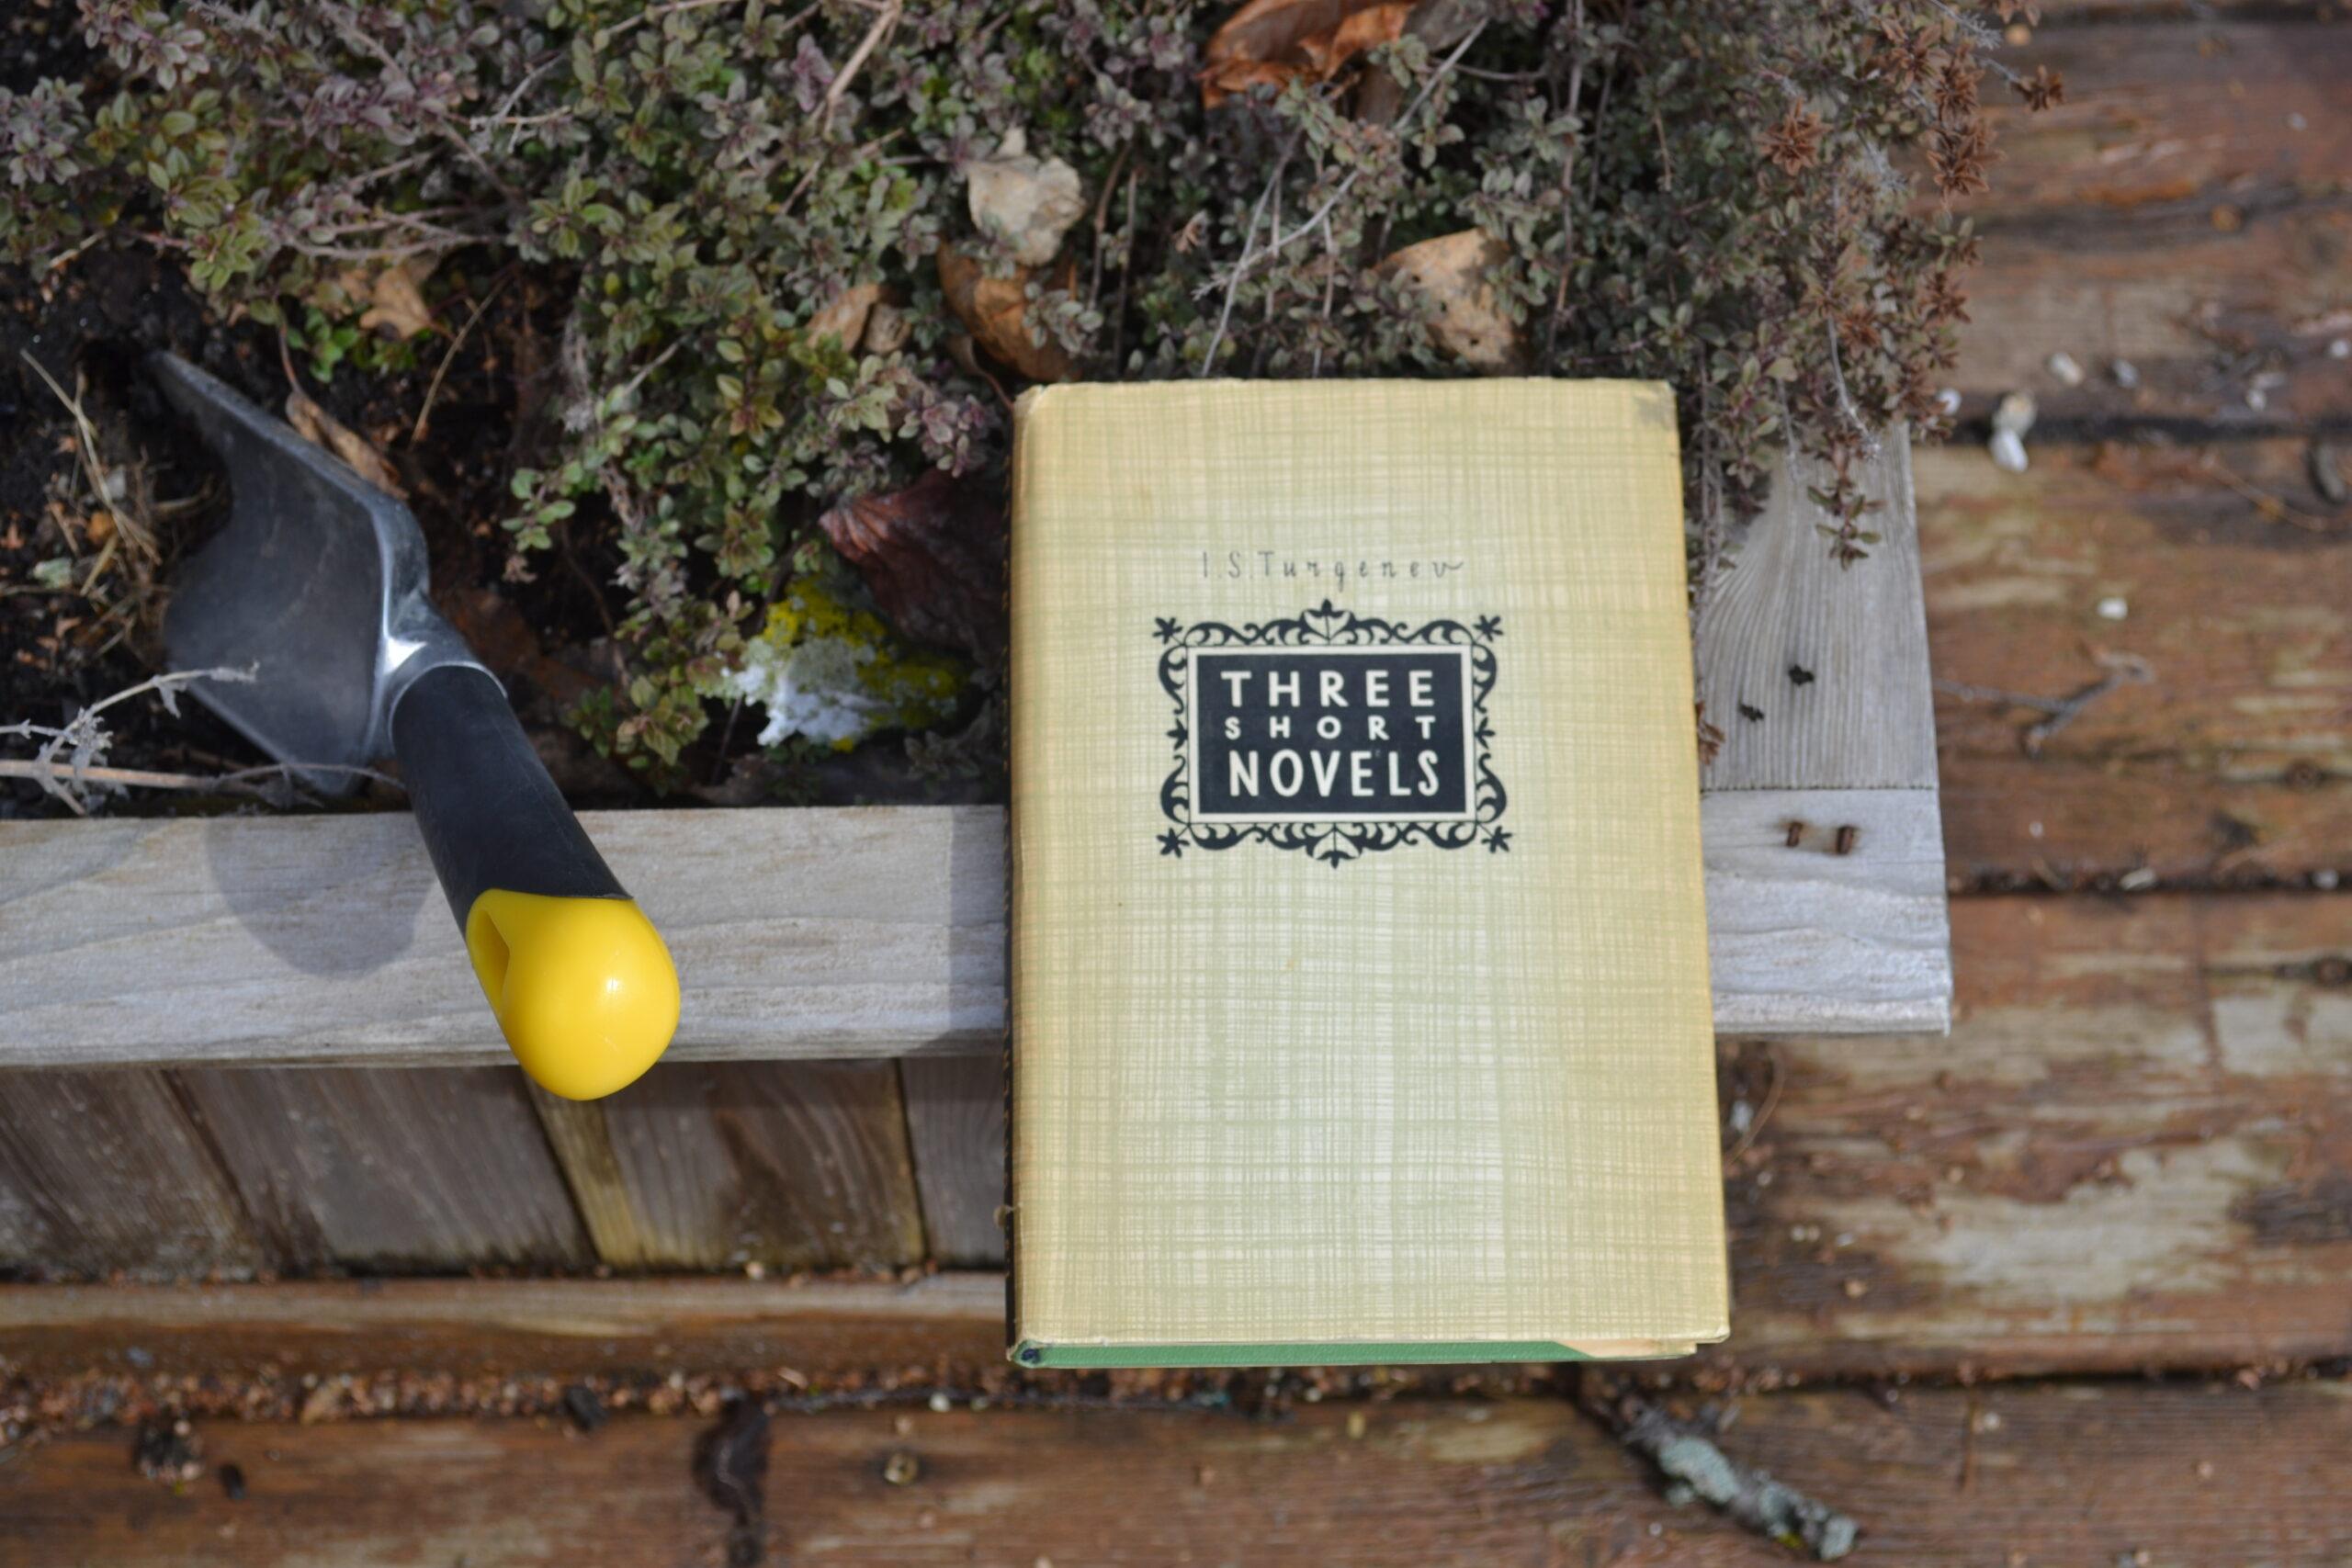 Three Short Novels